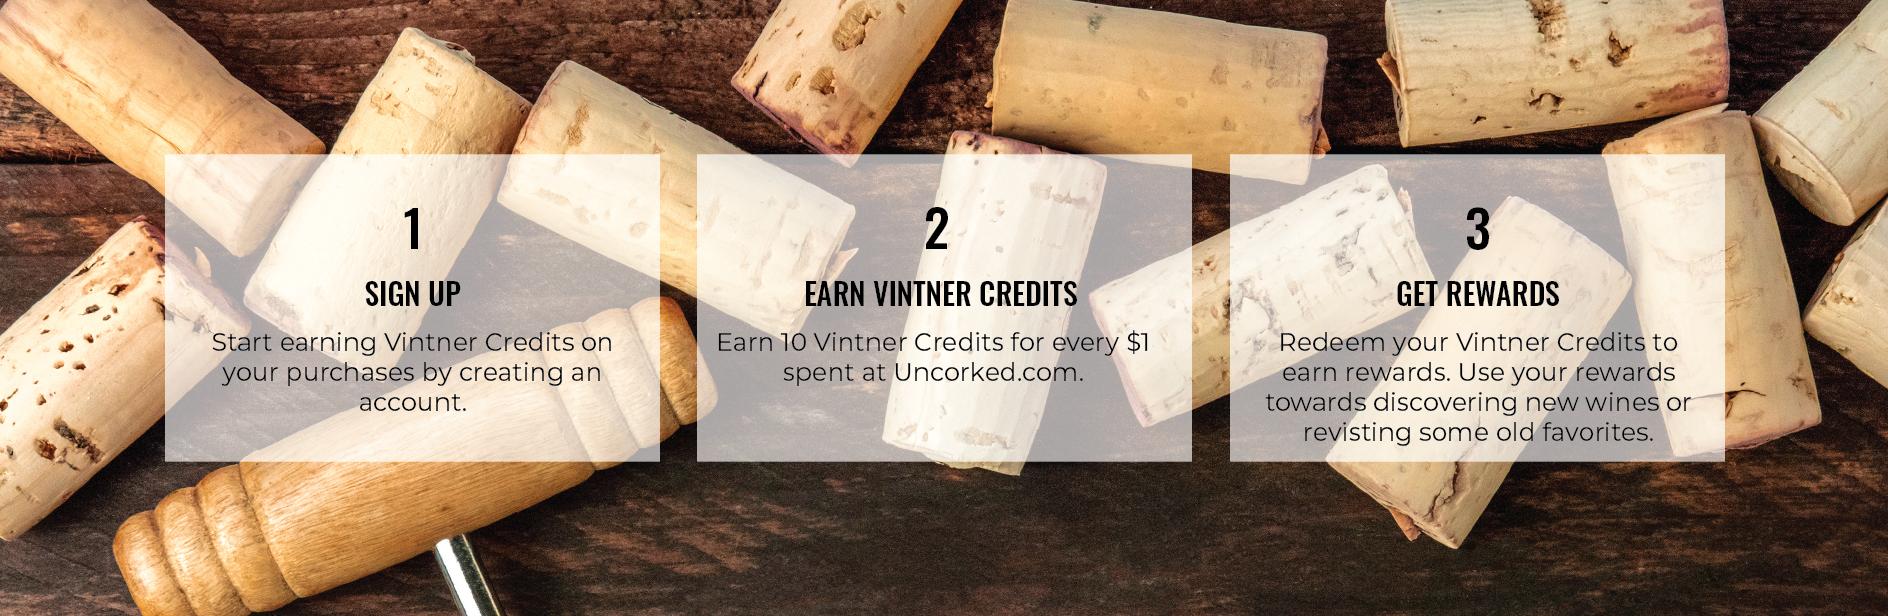 Vintner Credits